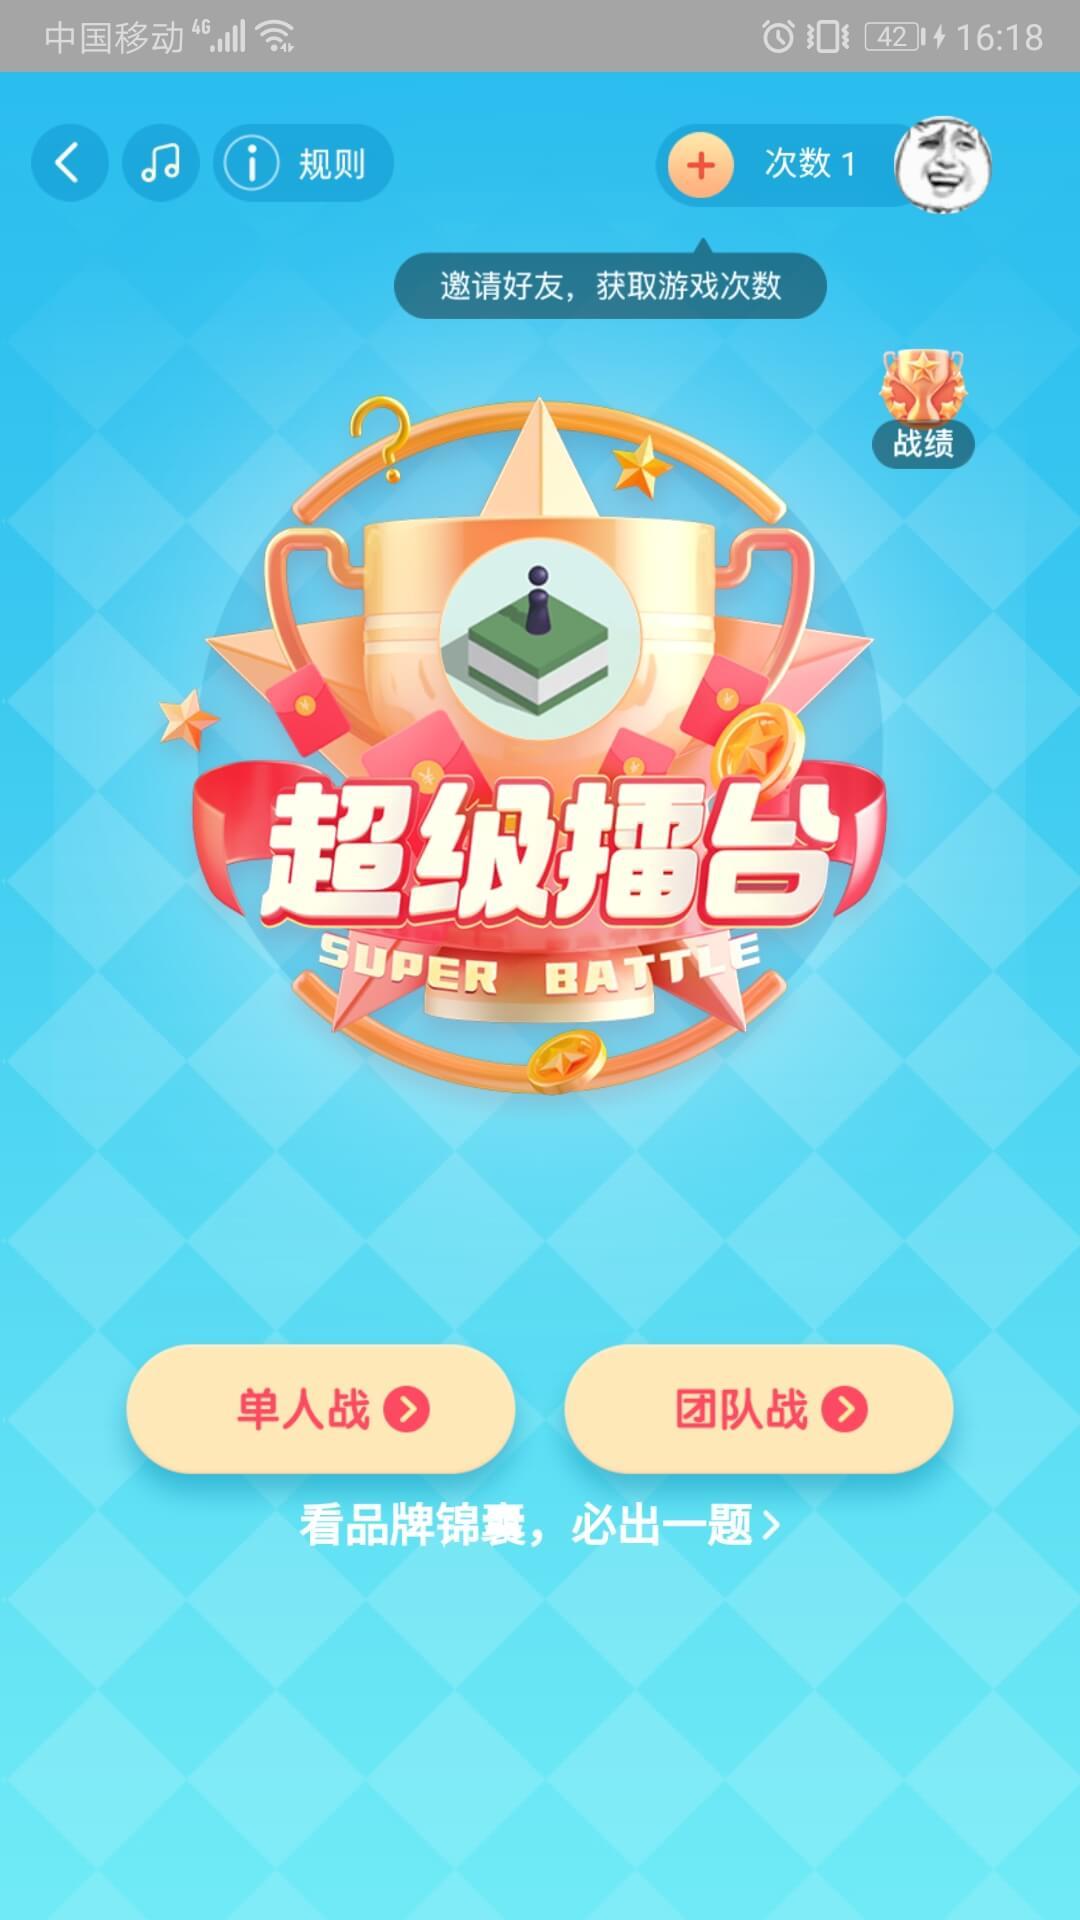 Screenshot_20190814_161813_com.taobao.taobao.jpg